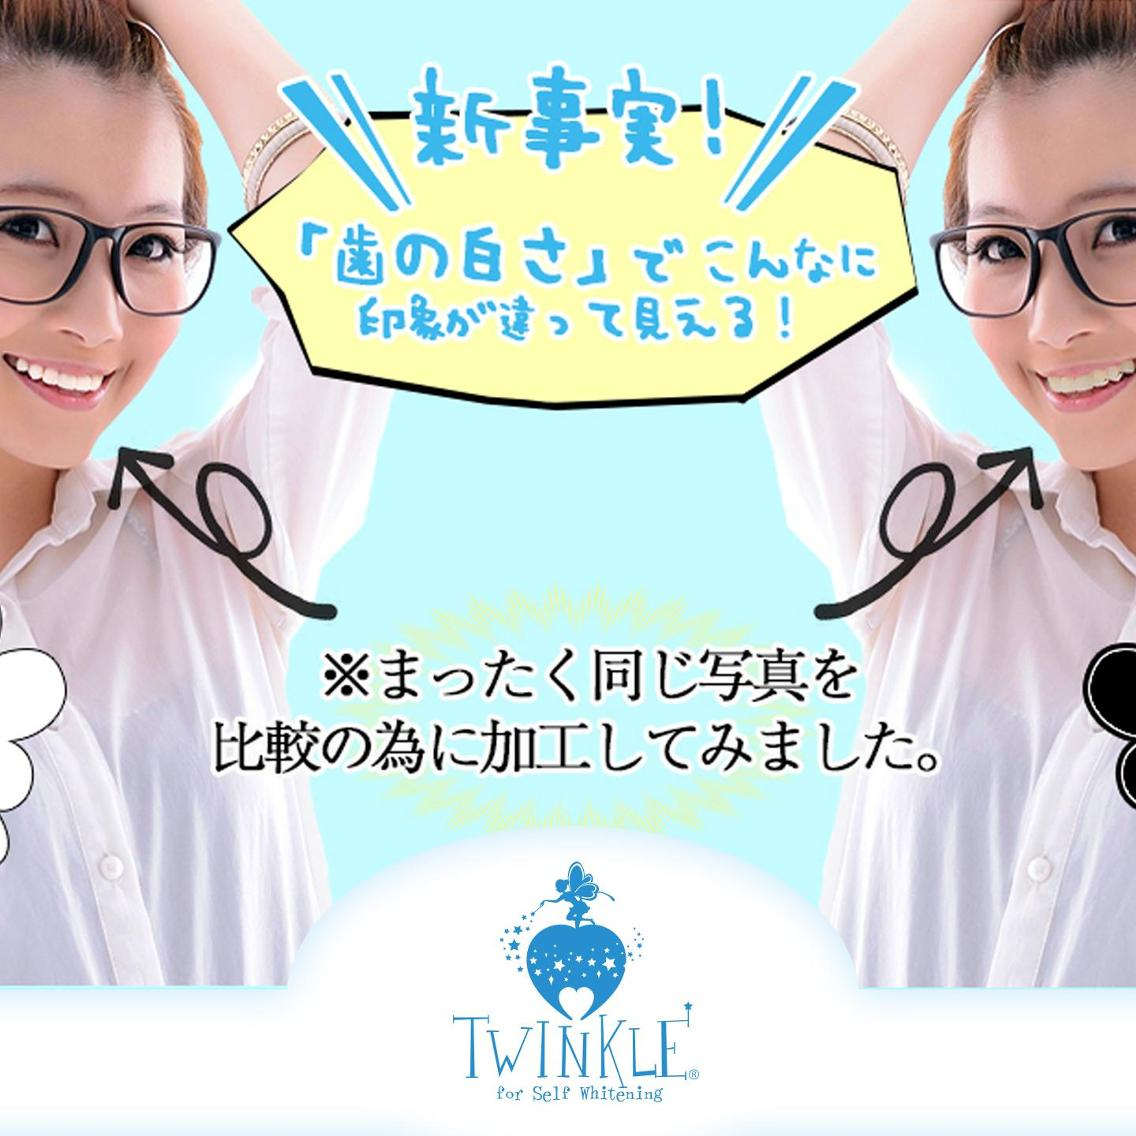 Twinkle White 浦和店所属・Twinkle White 浦和店の掲載